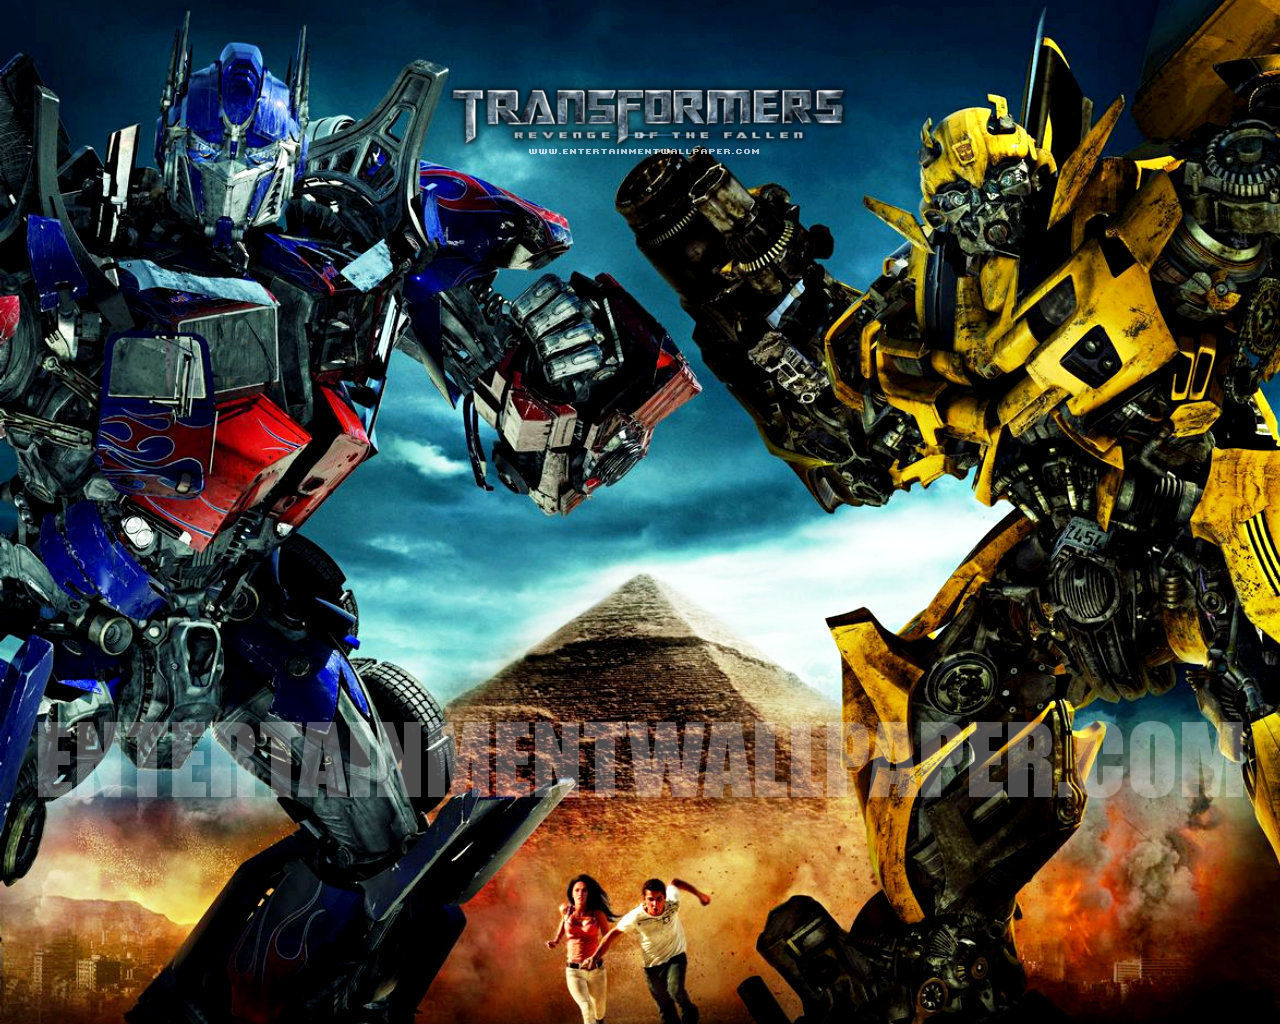 Wallpapers Dekstop 4 U: Transformers 2 Wallpaper